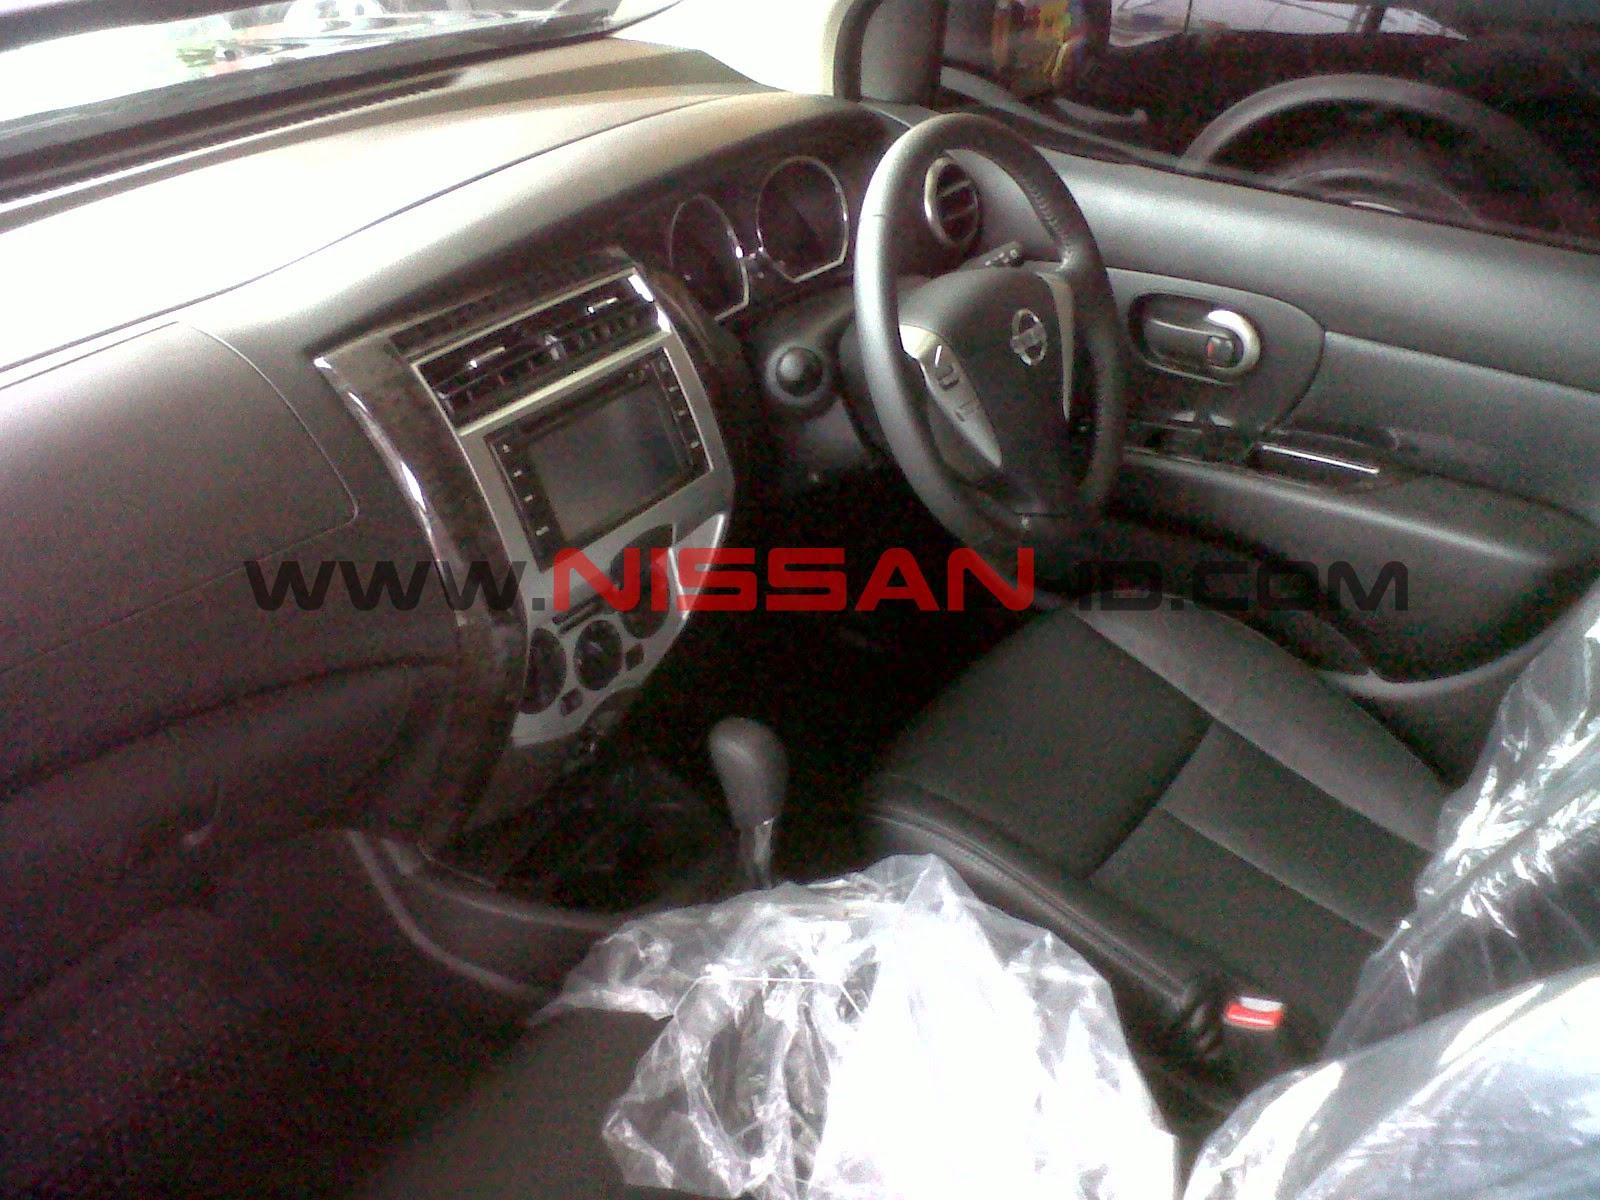 ukuran ban grand new veloz all alphard 2018 harga spesifikasi nissan grandlivina sv xv hws autech 2015